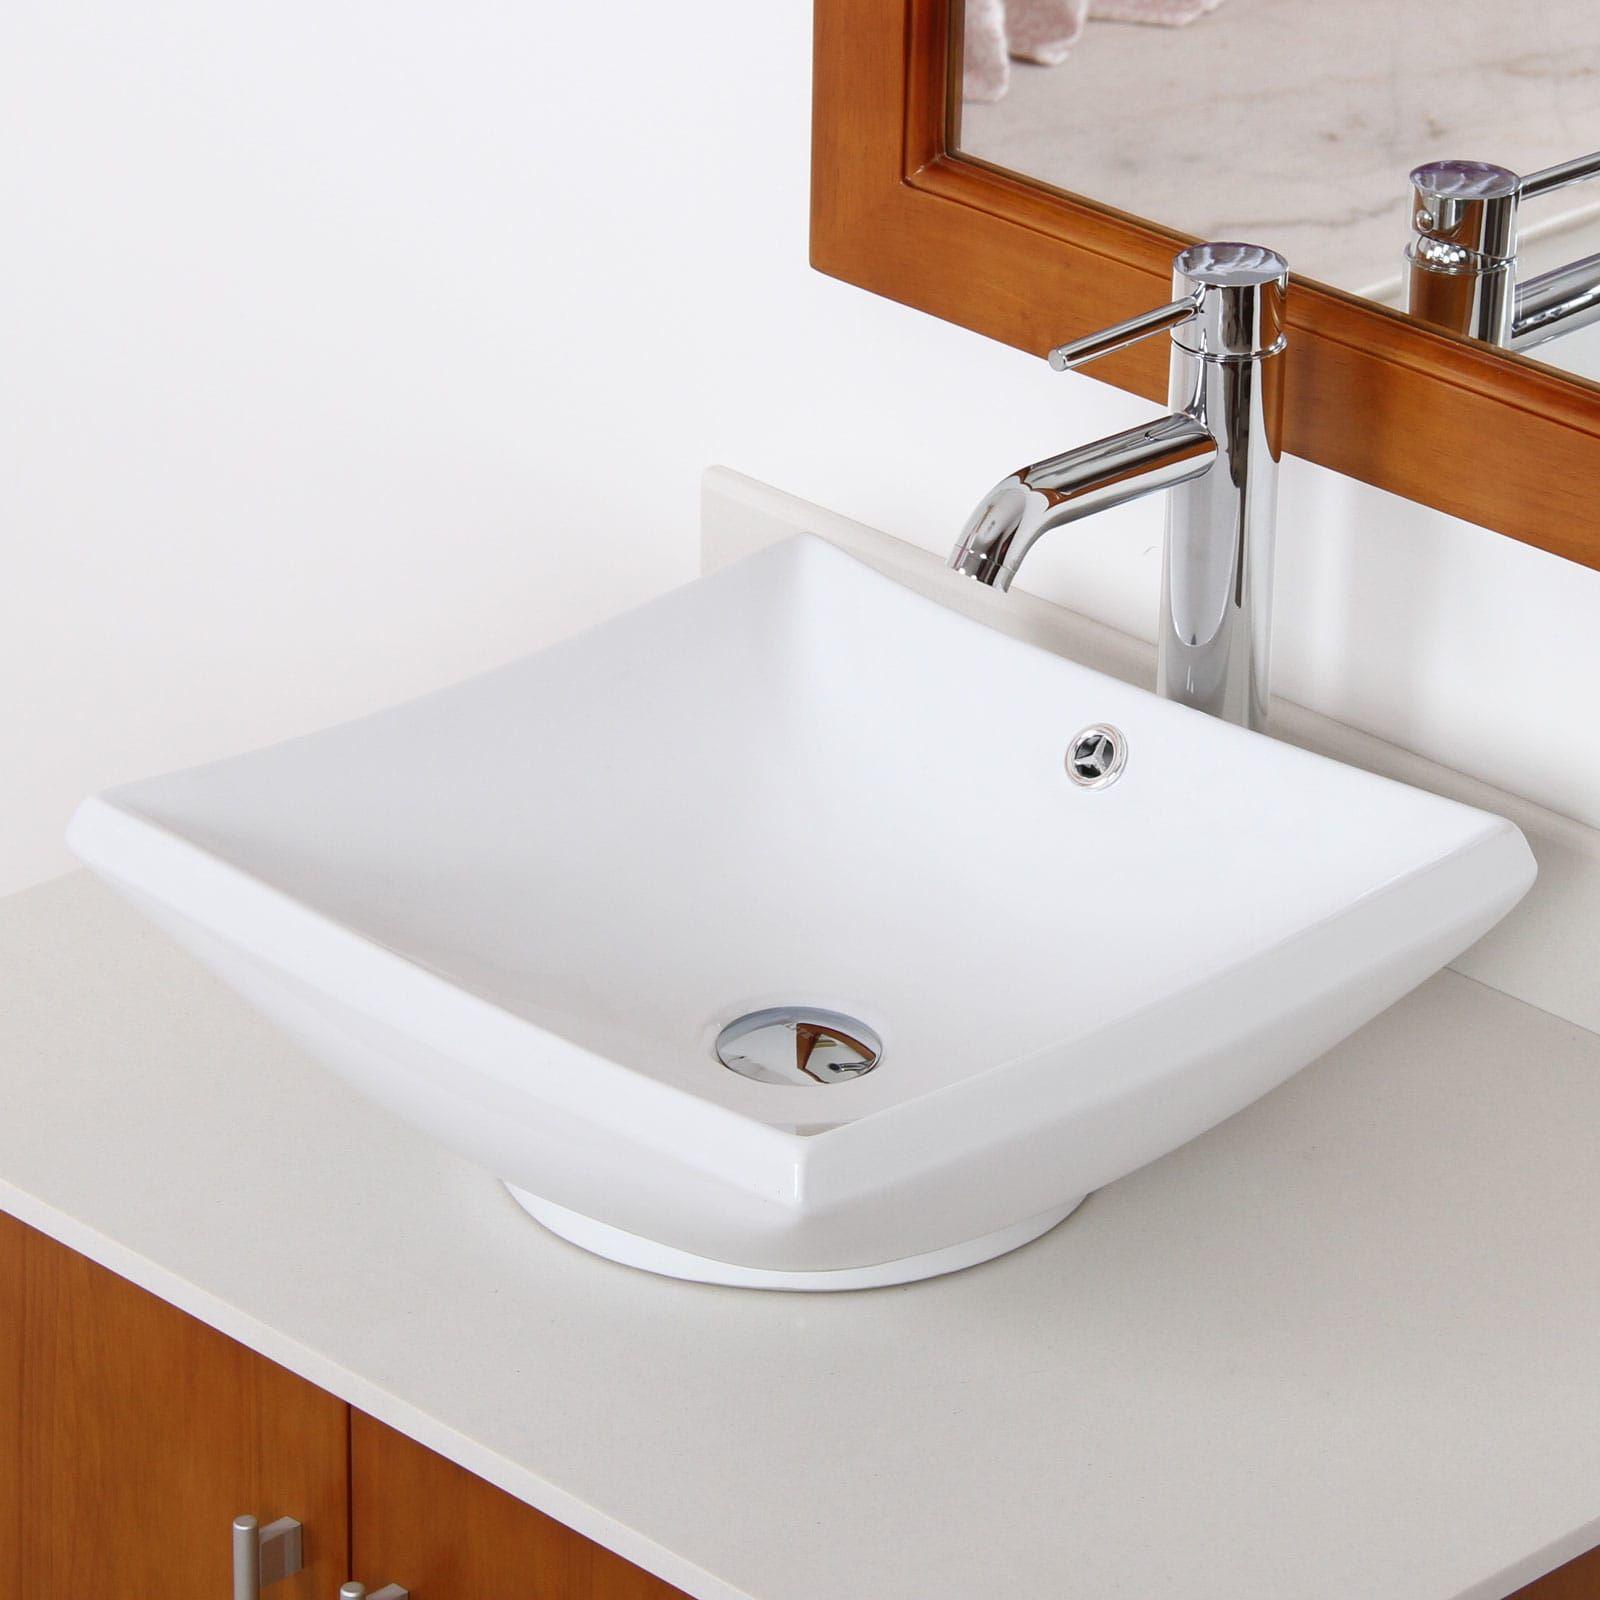 Elite 4125f371023c High Temperature Grade A Ceramic Bathroom Sink With Square Design And Chrome Finish Faucet Combo Bathroom Faucets Bathroom Single Handle Bathroom Faucet